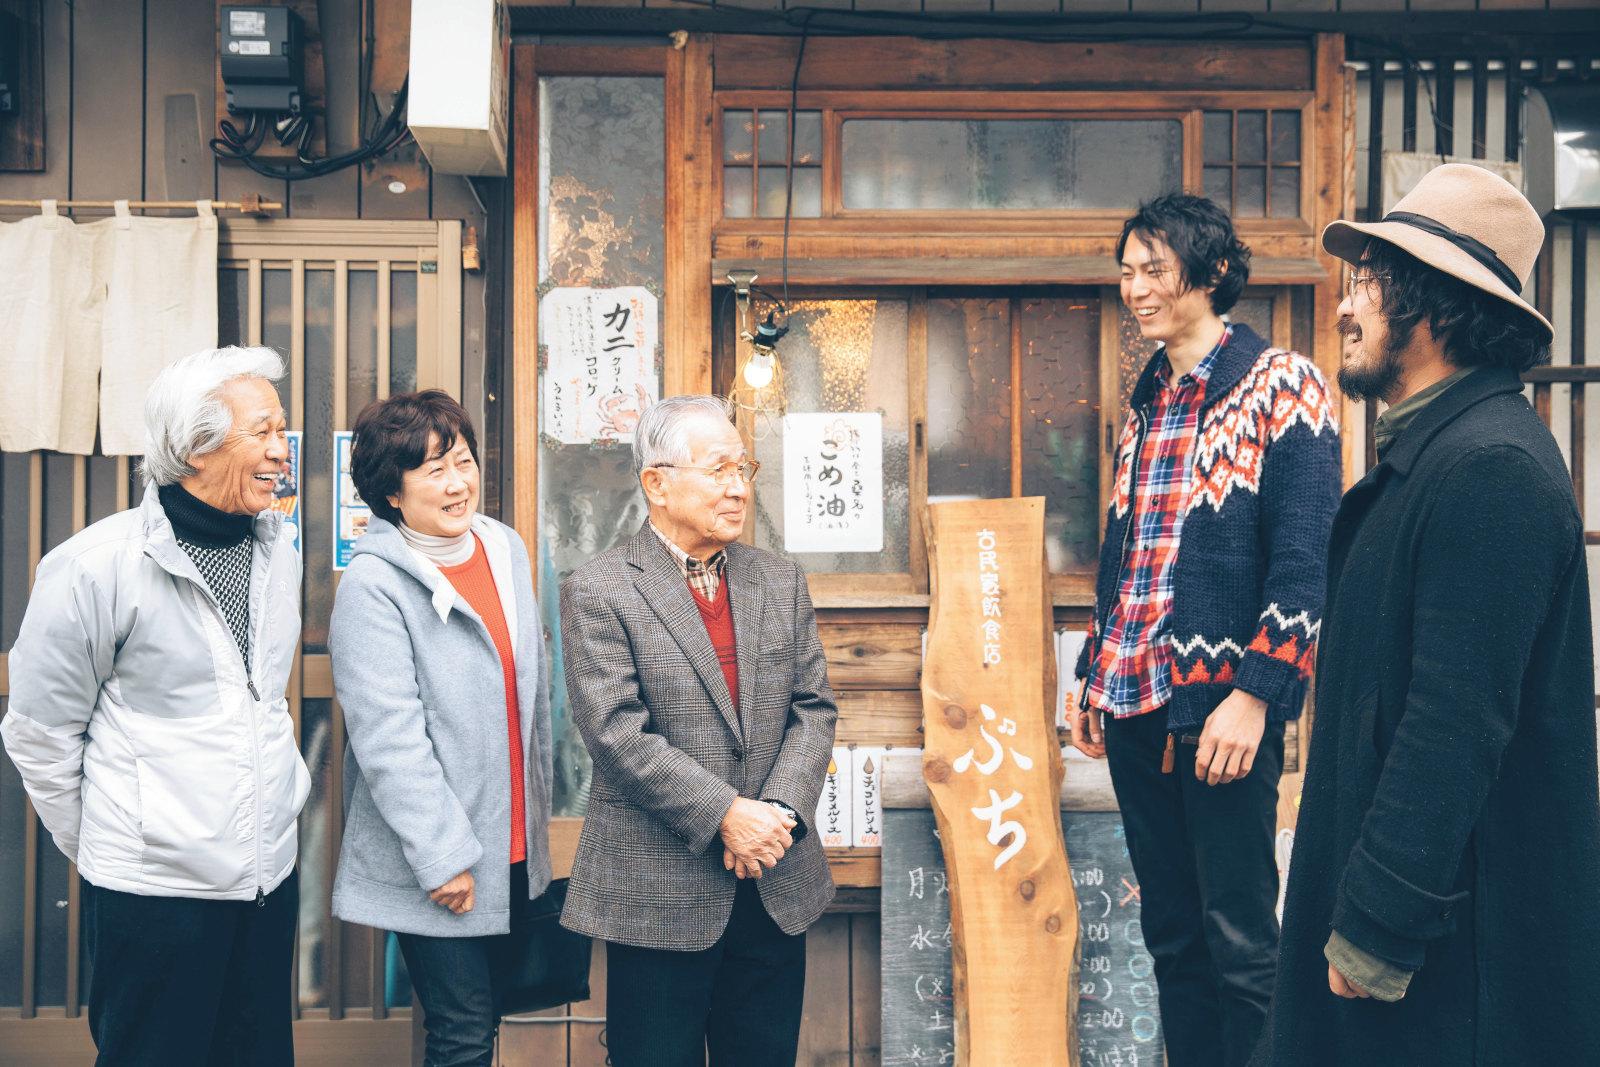 『On-Co』の活動を見守る、名古屋・西区栄生の前自治会長・古橋義兼さん